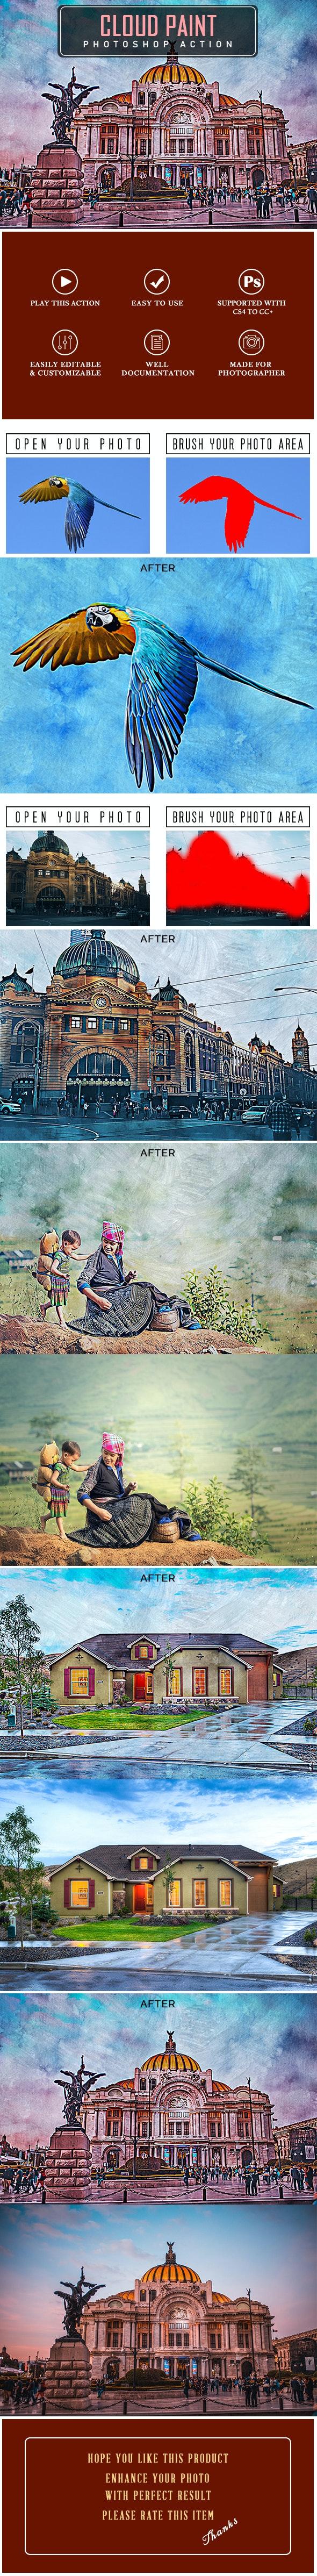 Cloud Paint Photoshop Action - Photo Effects Actions